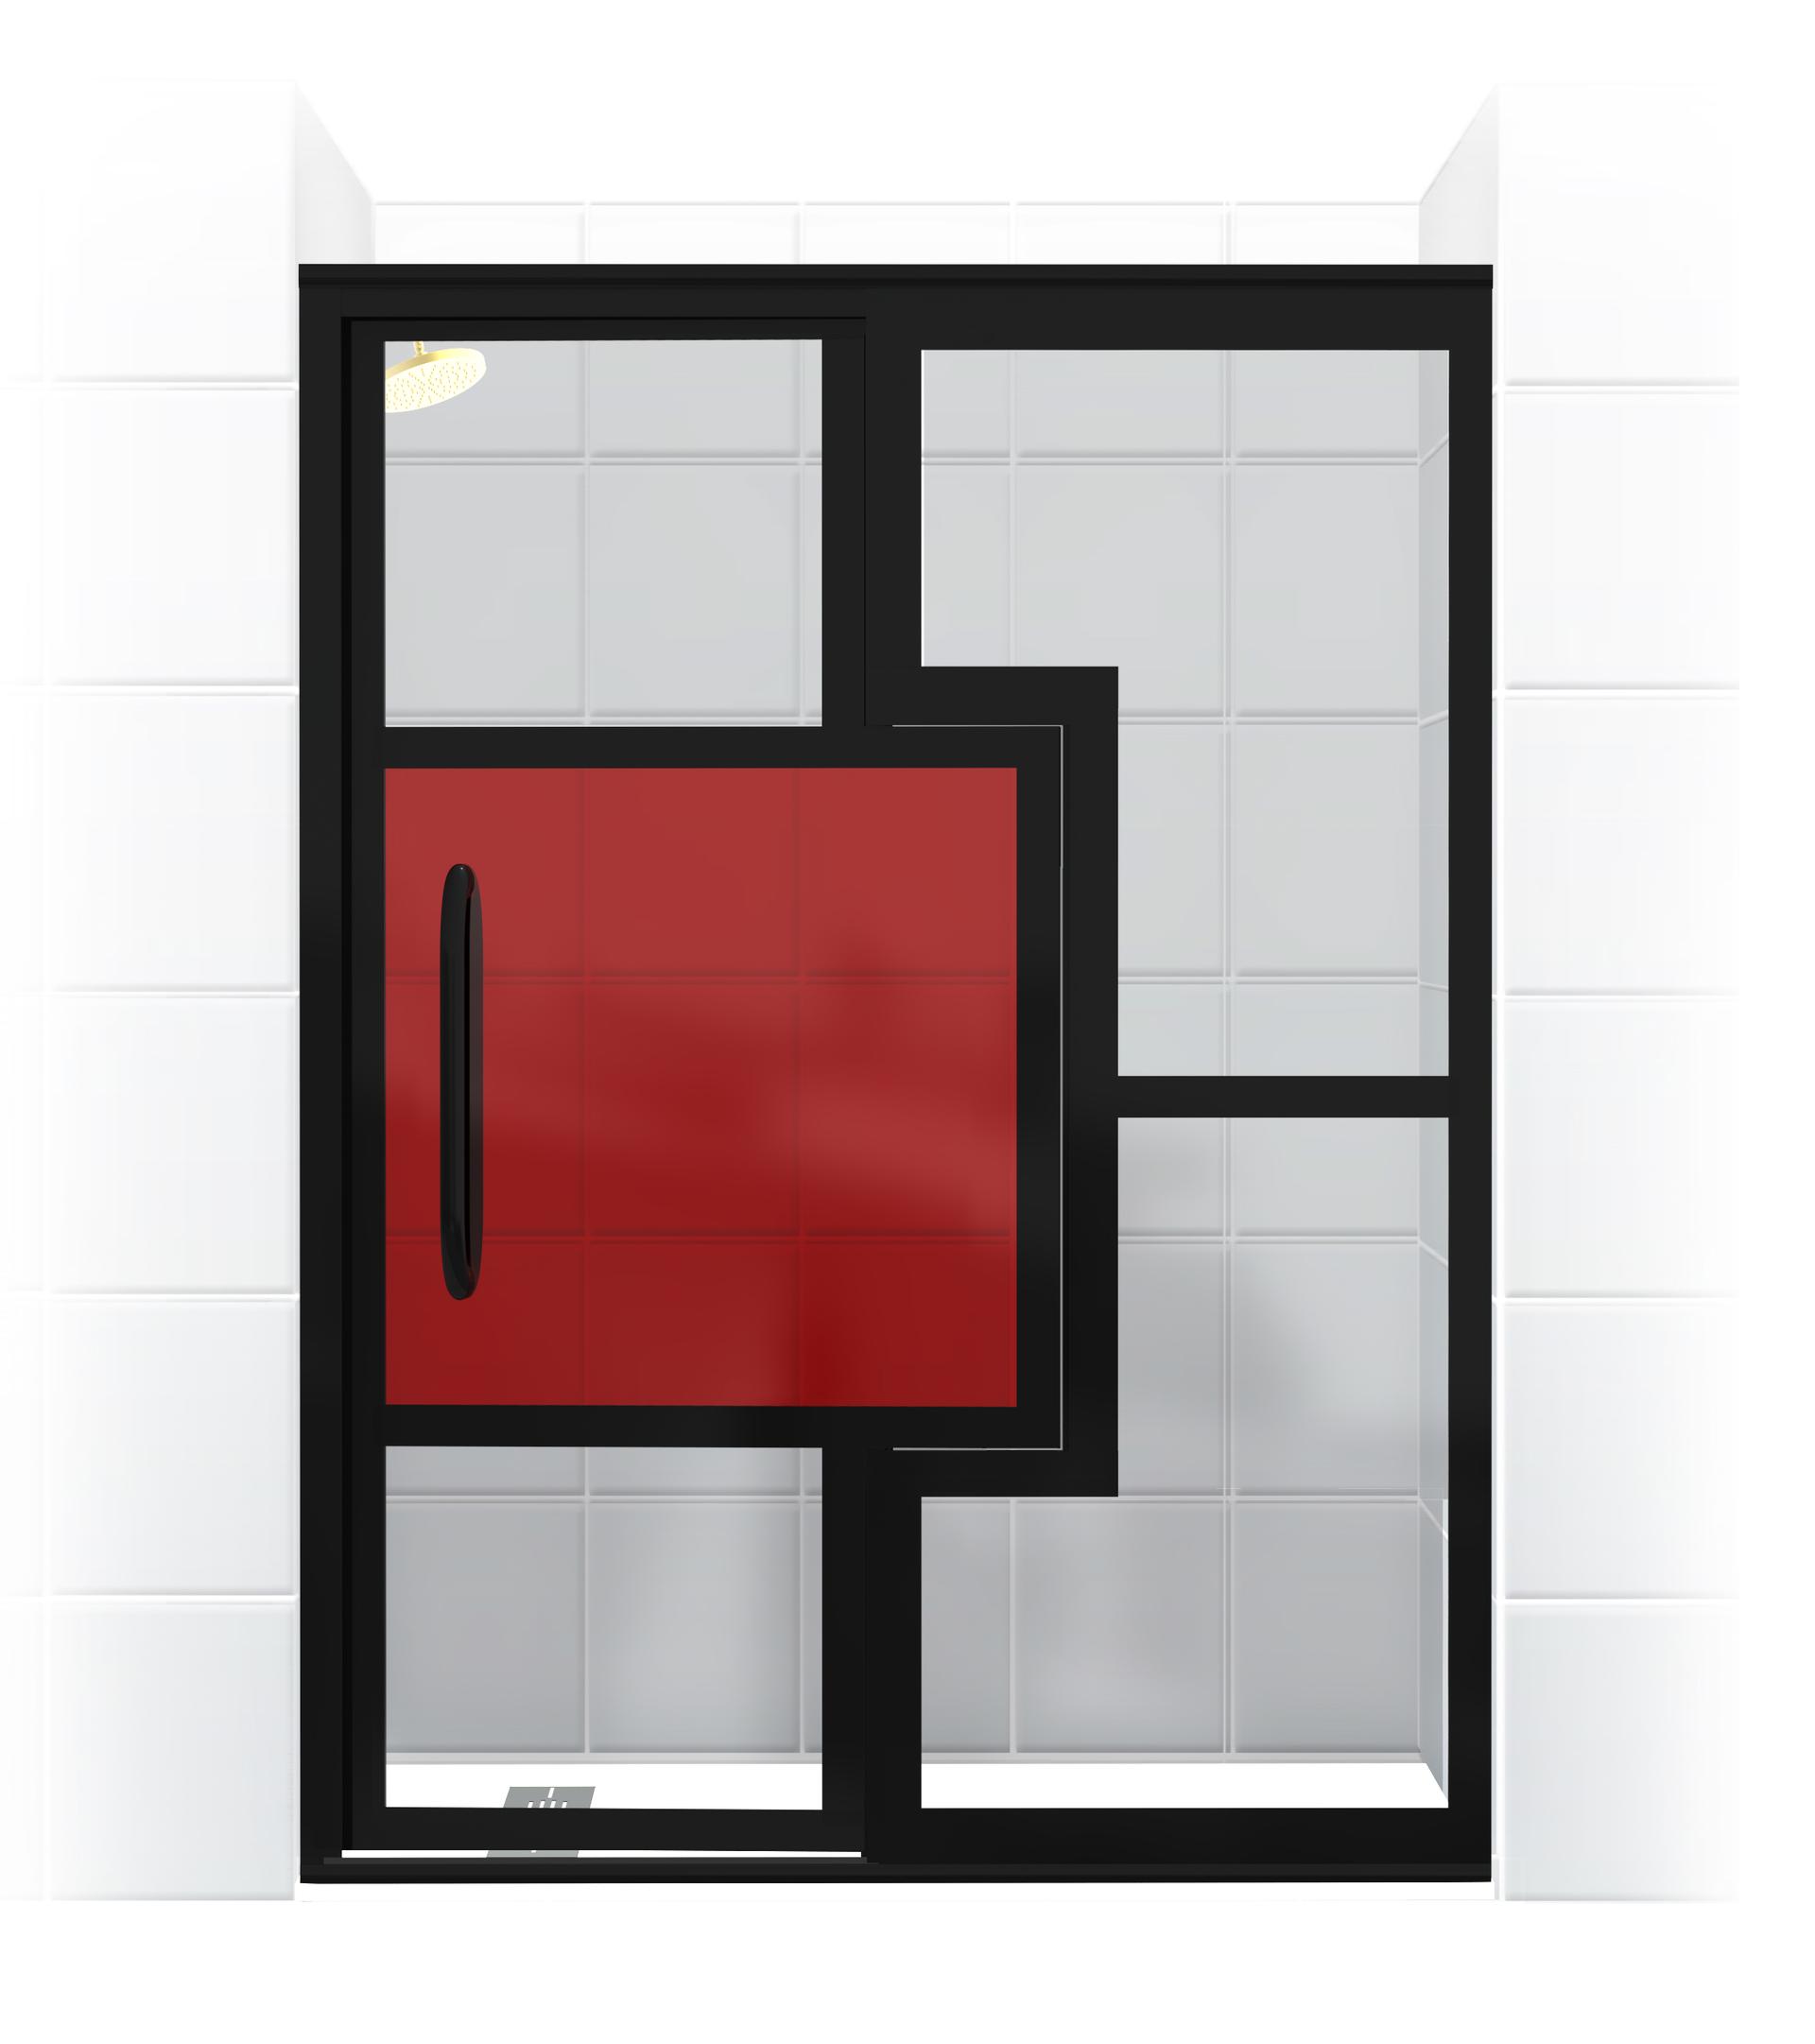 Mondrian Shower Door For Residential Pro